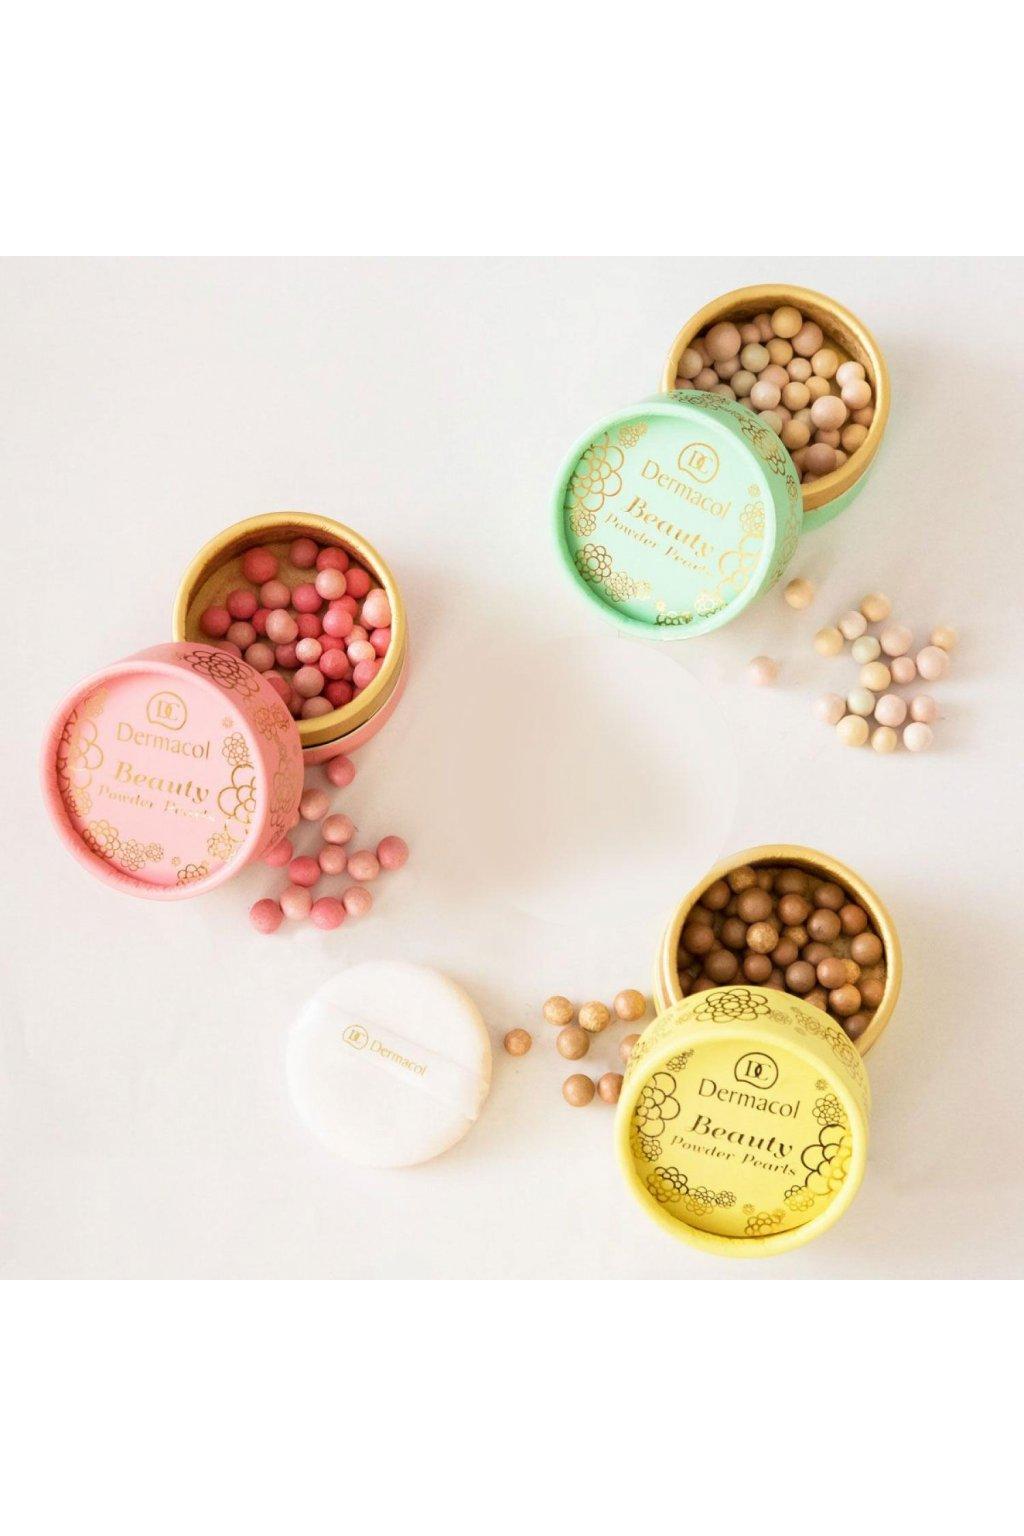 dermacol beauty powder pearls rozjasnovac pro zeny 25 g